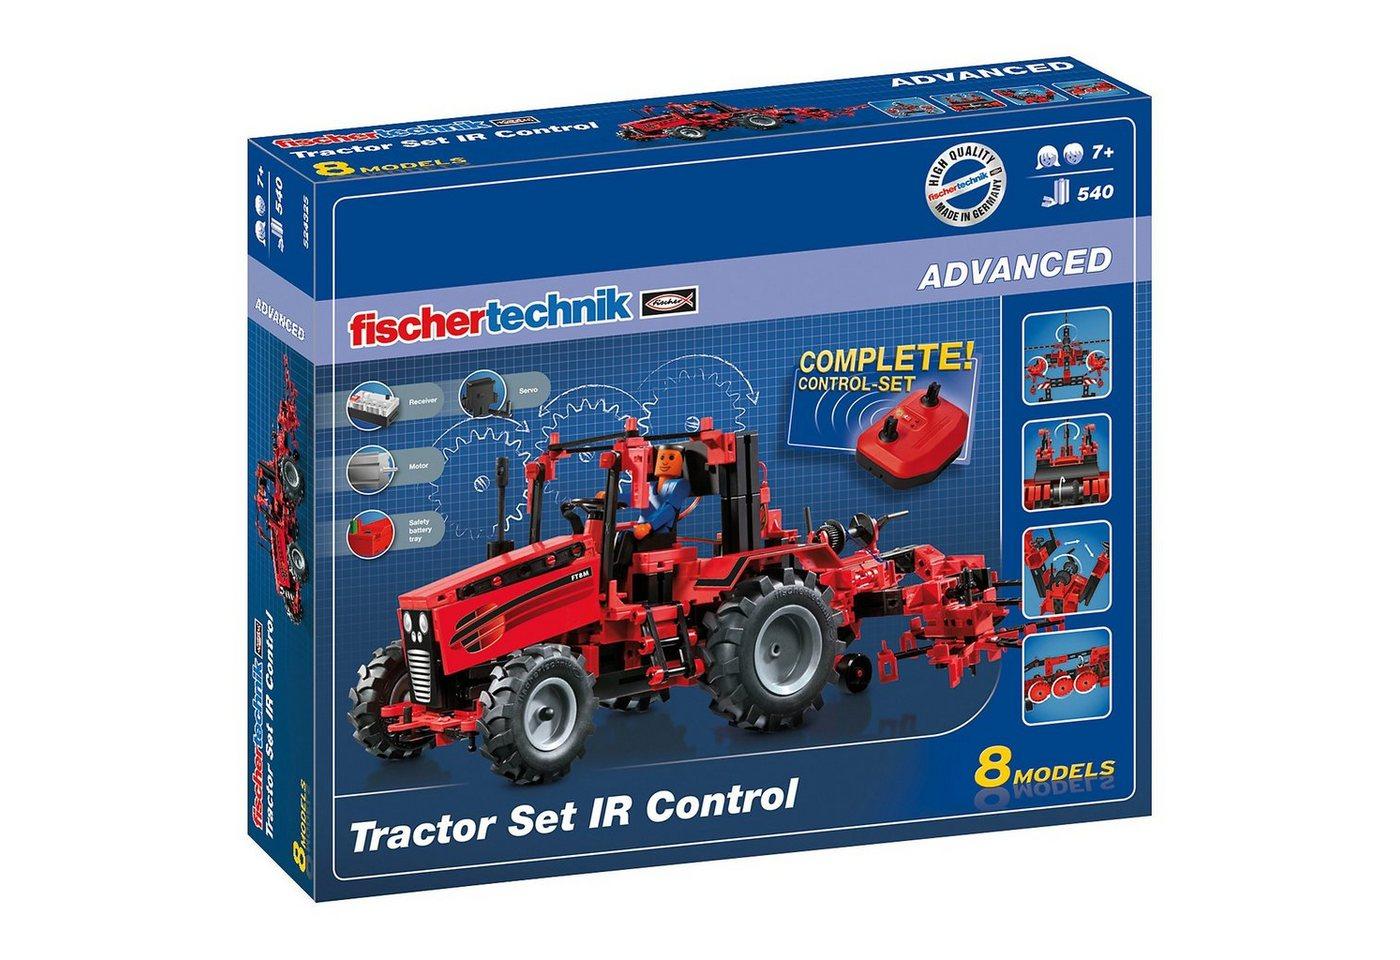 fischertechnik ADVANCED ´´Tractor Set IR Control´´ - Traktor Set mit Fernsteu